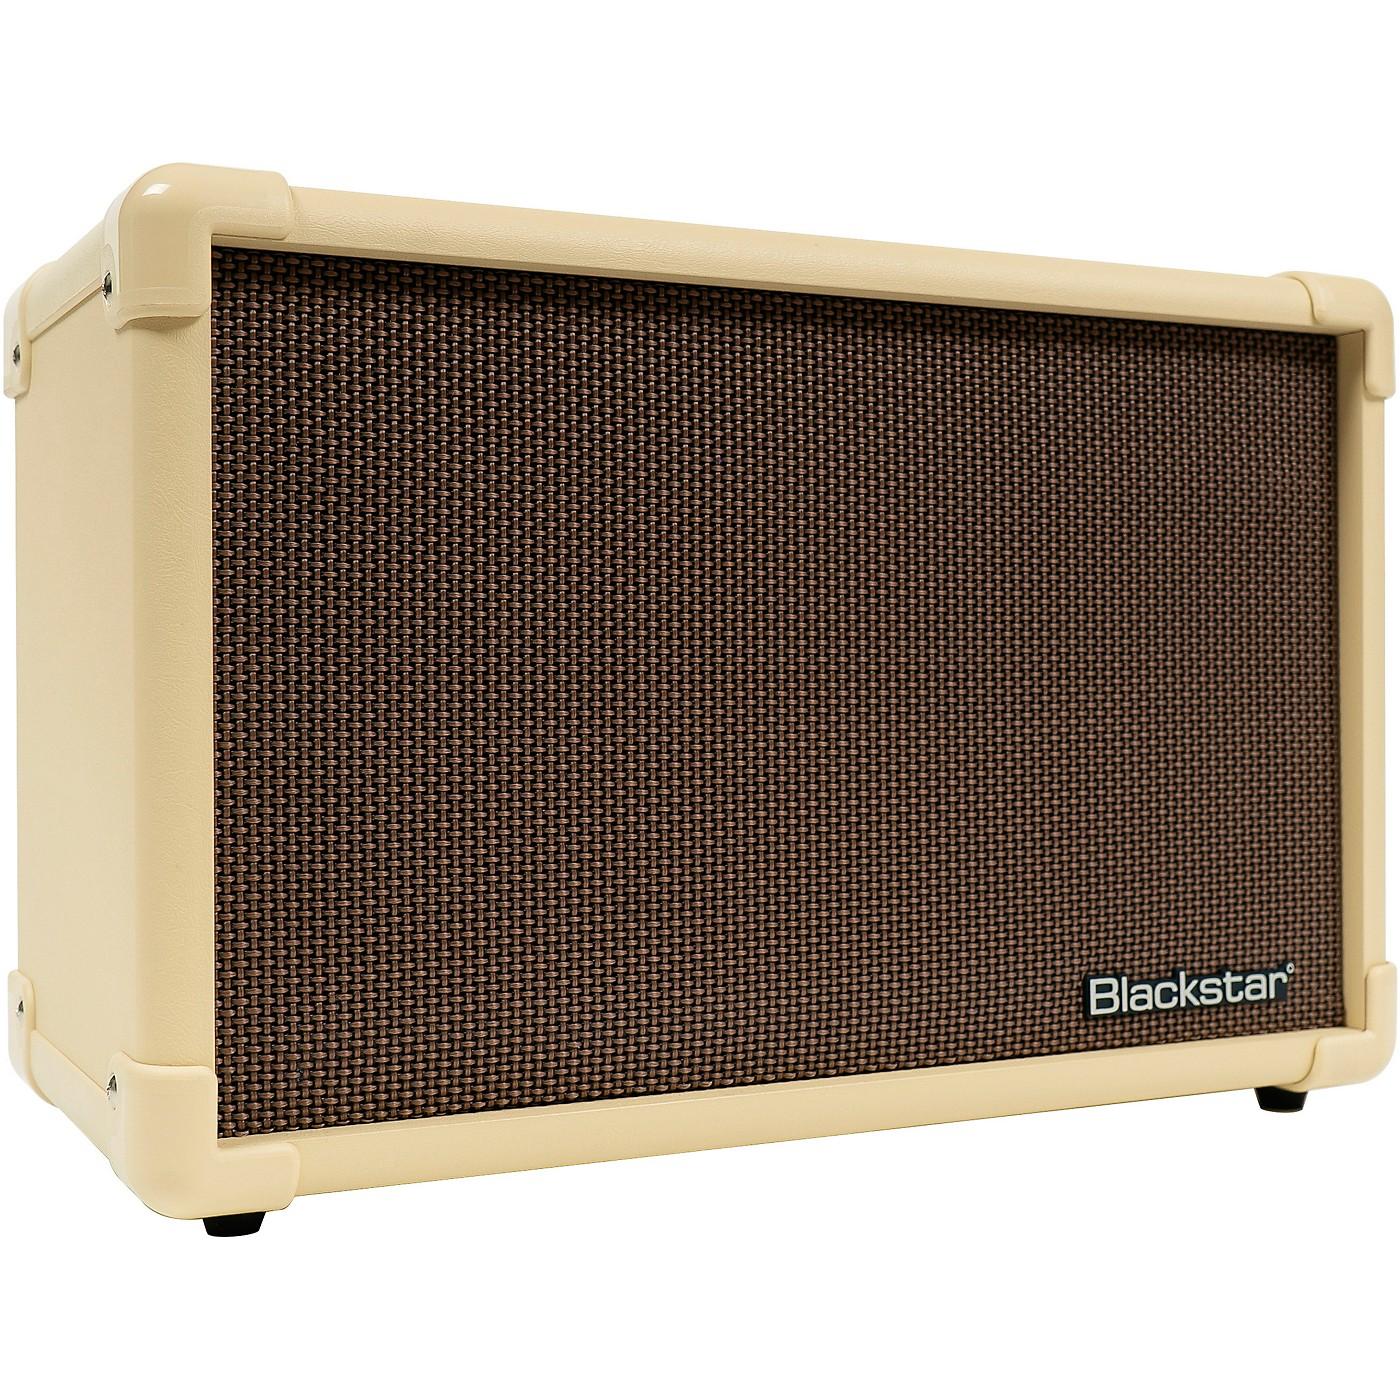 Blackstar Blackstar Acouscore30 30W Acoustic Guitar amplifier thumbnail